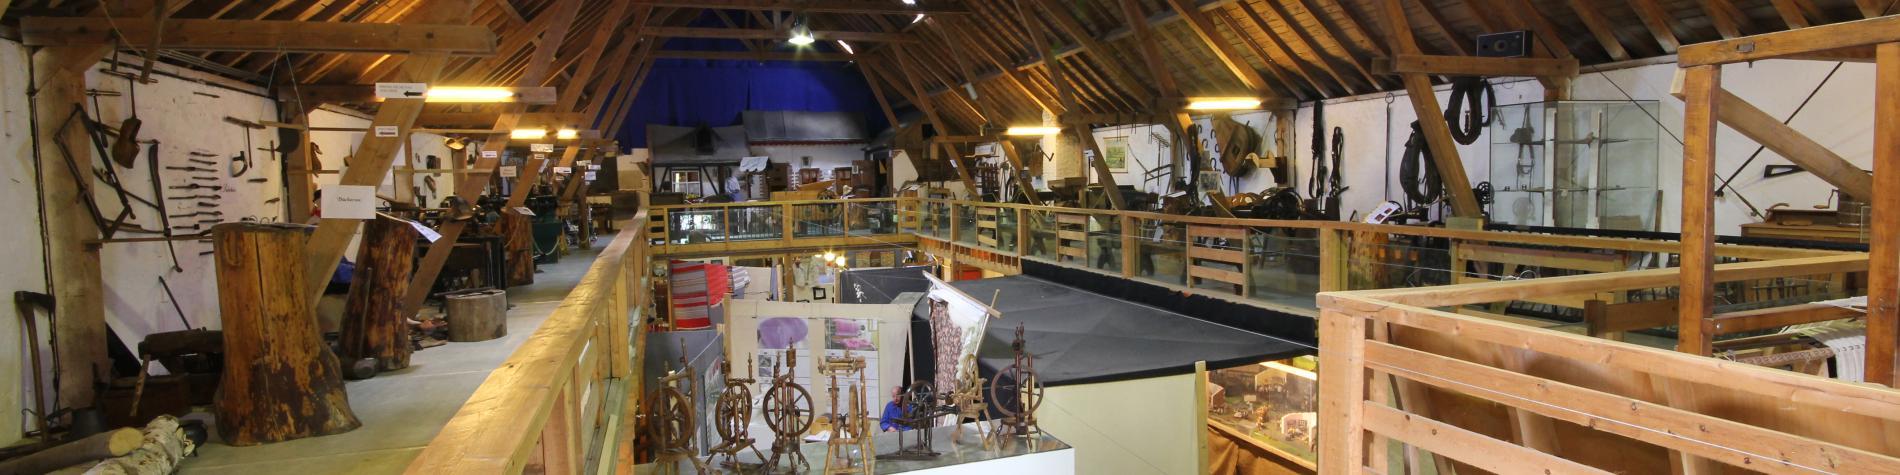 Ontdek het wolmuseum en het dierenpark Animalaine in Bastogne